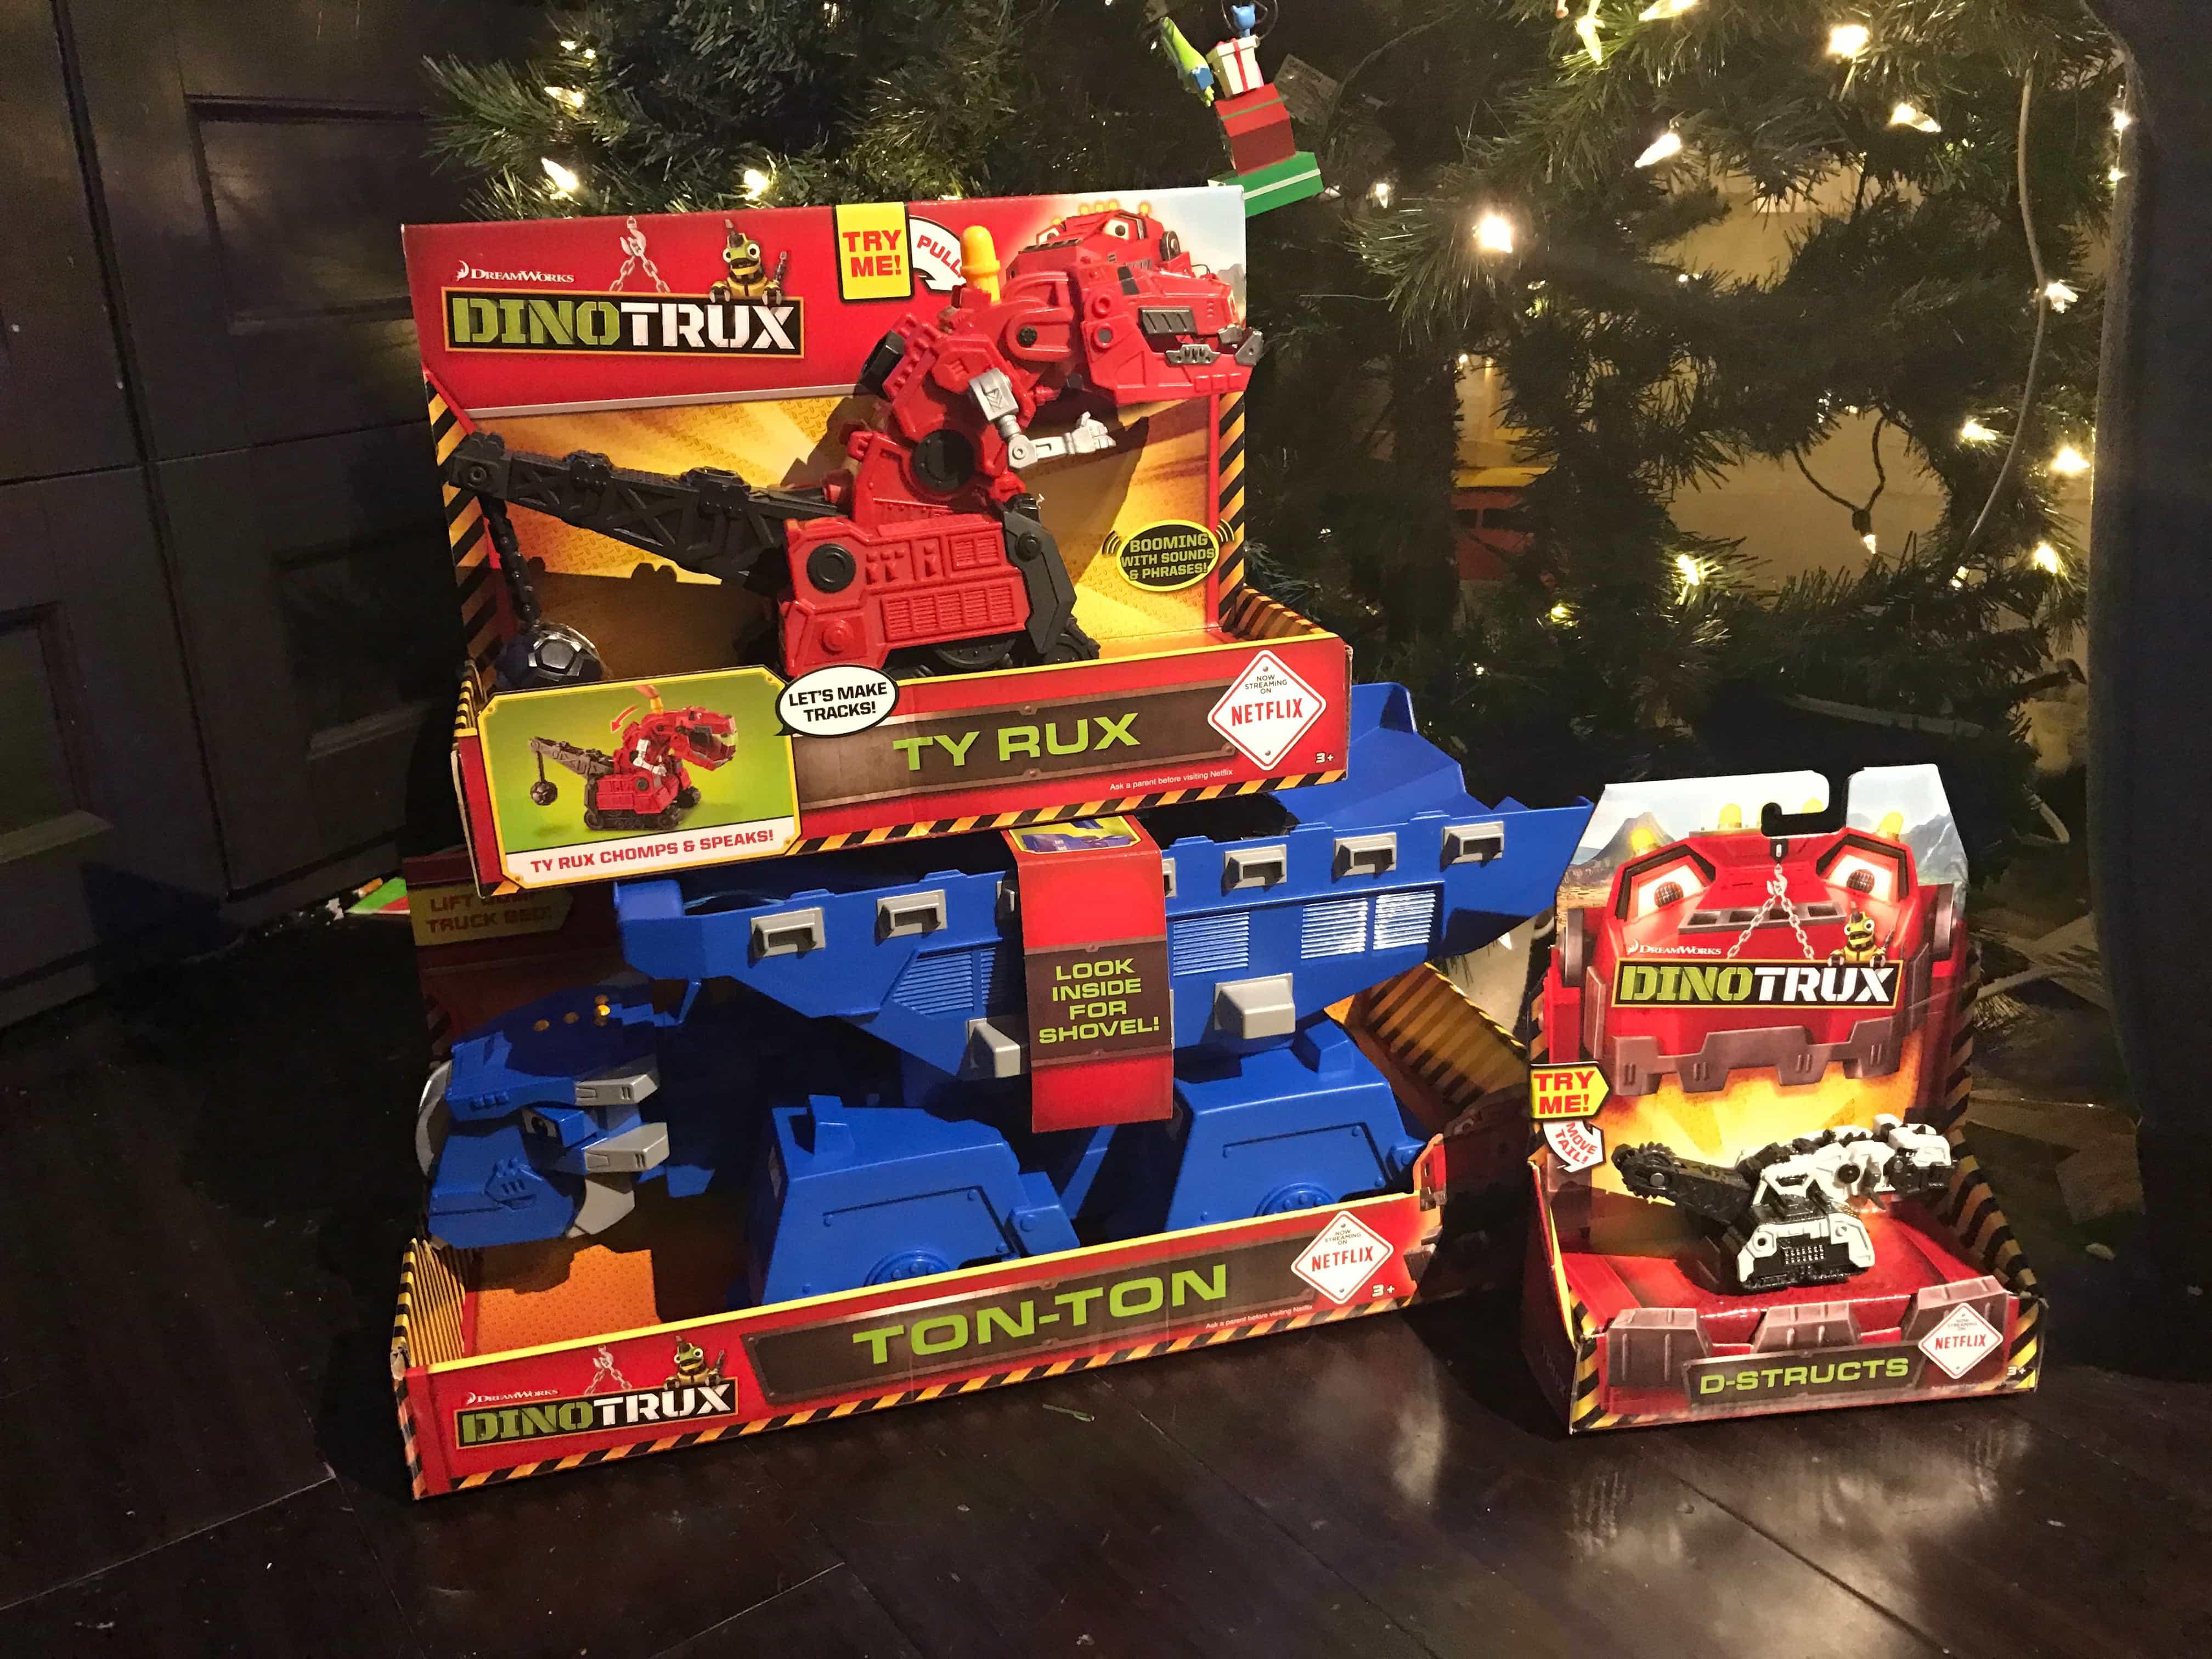 Dino Trux under the tree